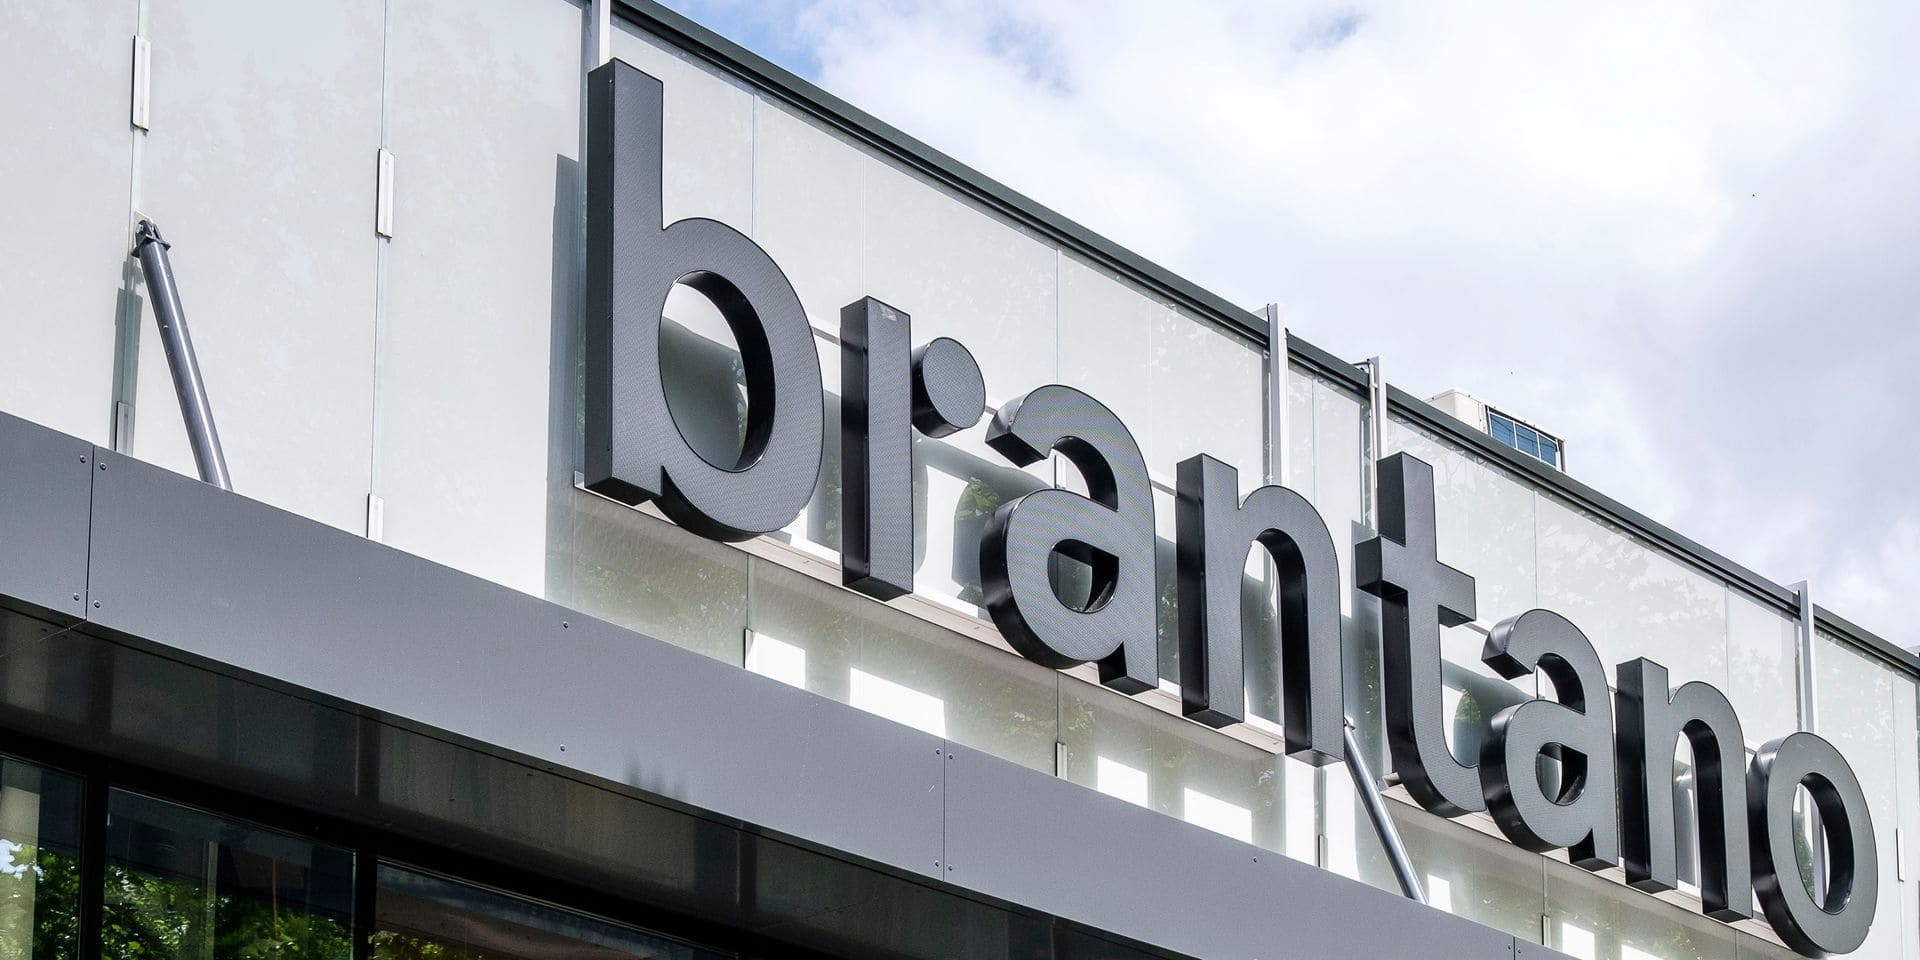 Faillite prononcée pour Brantano